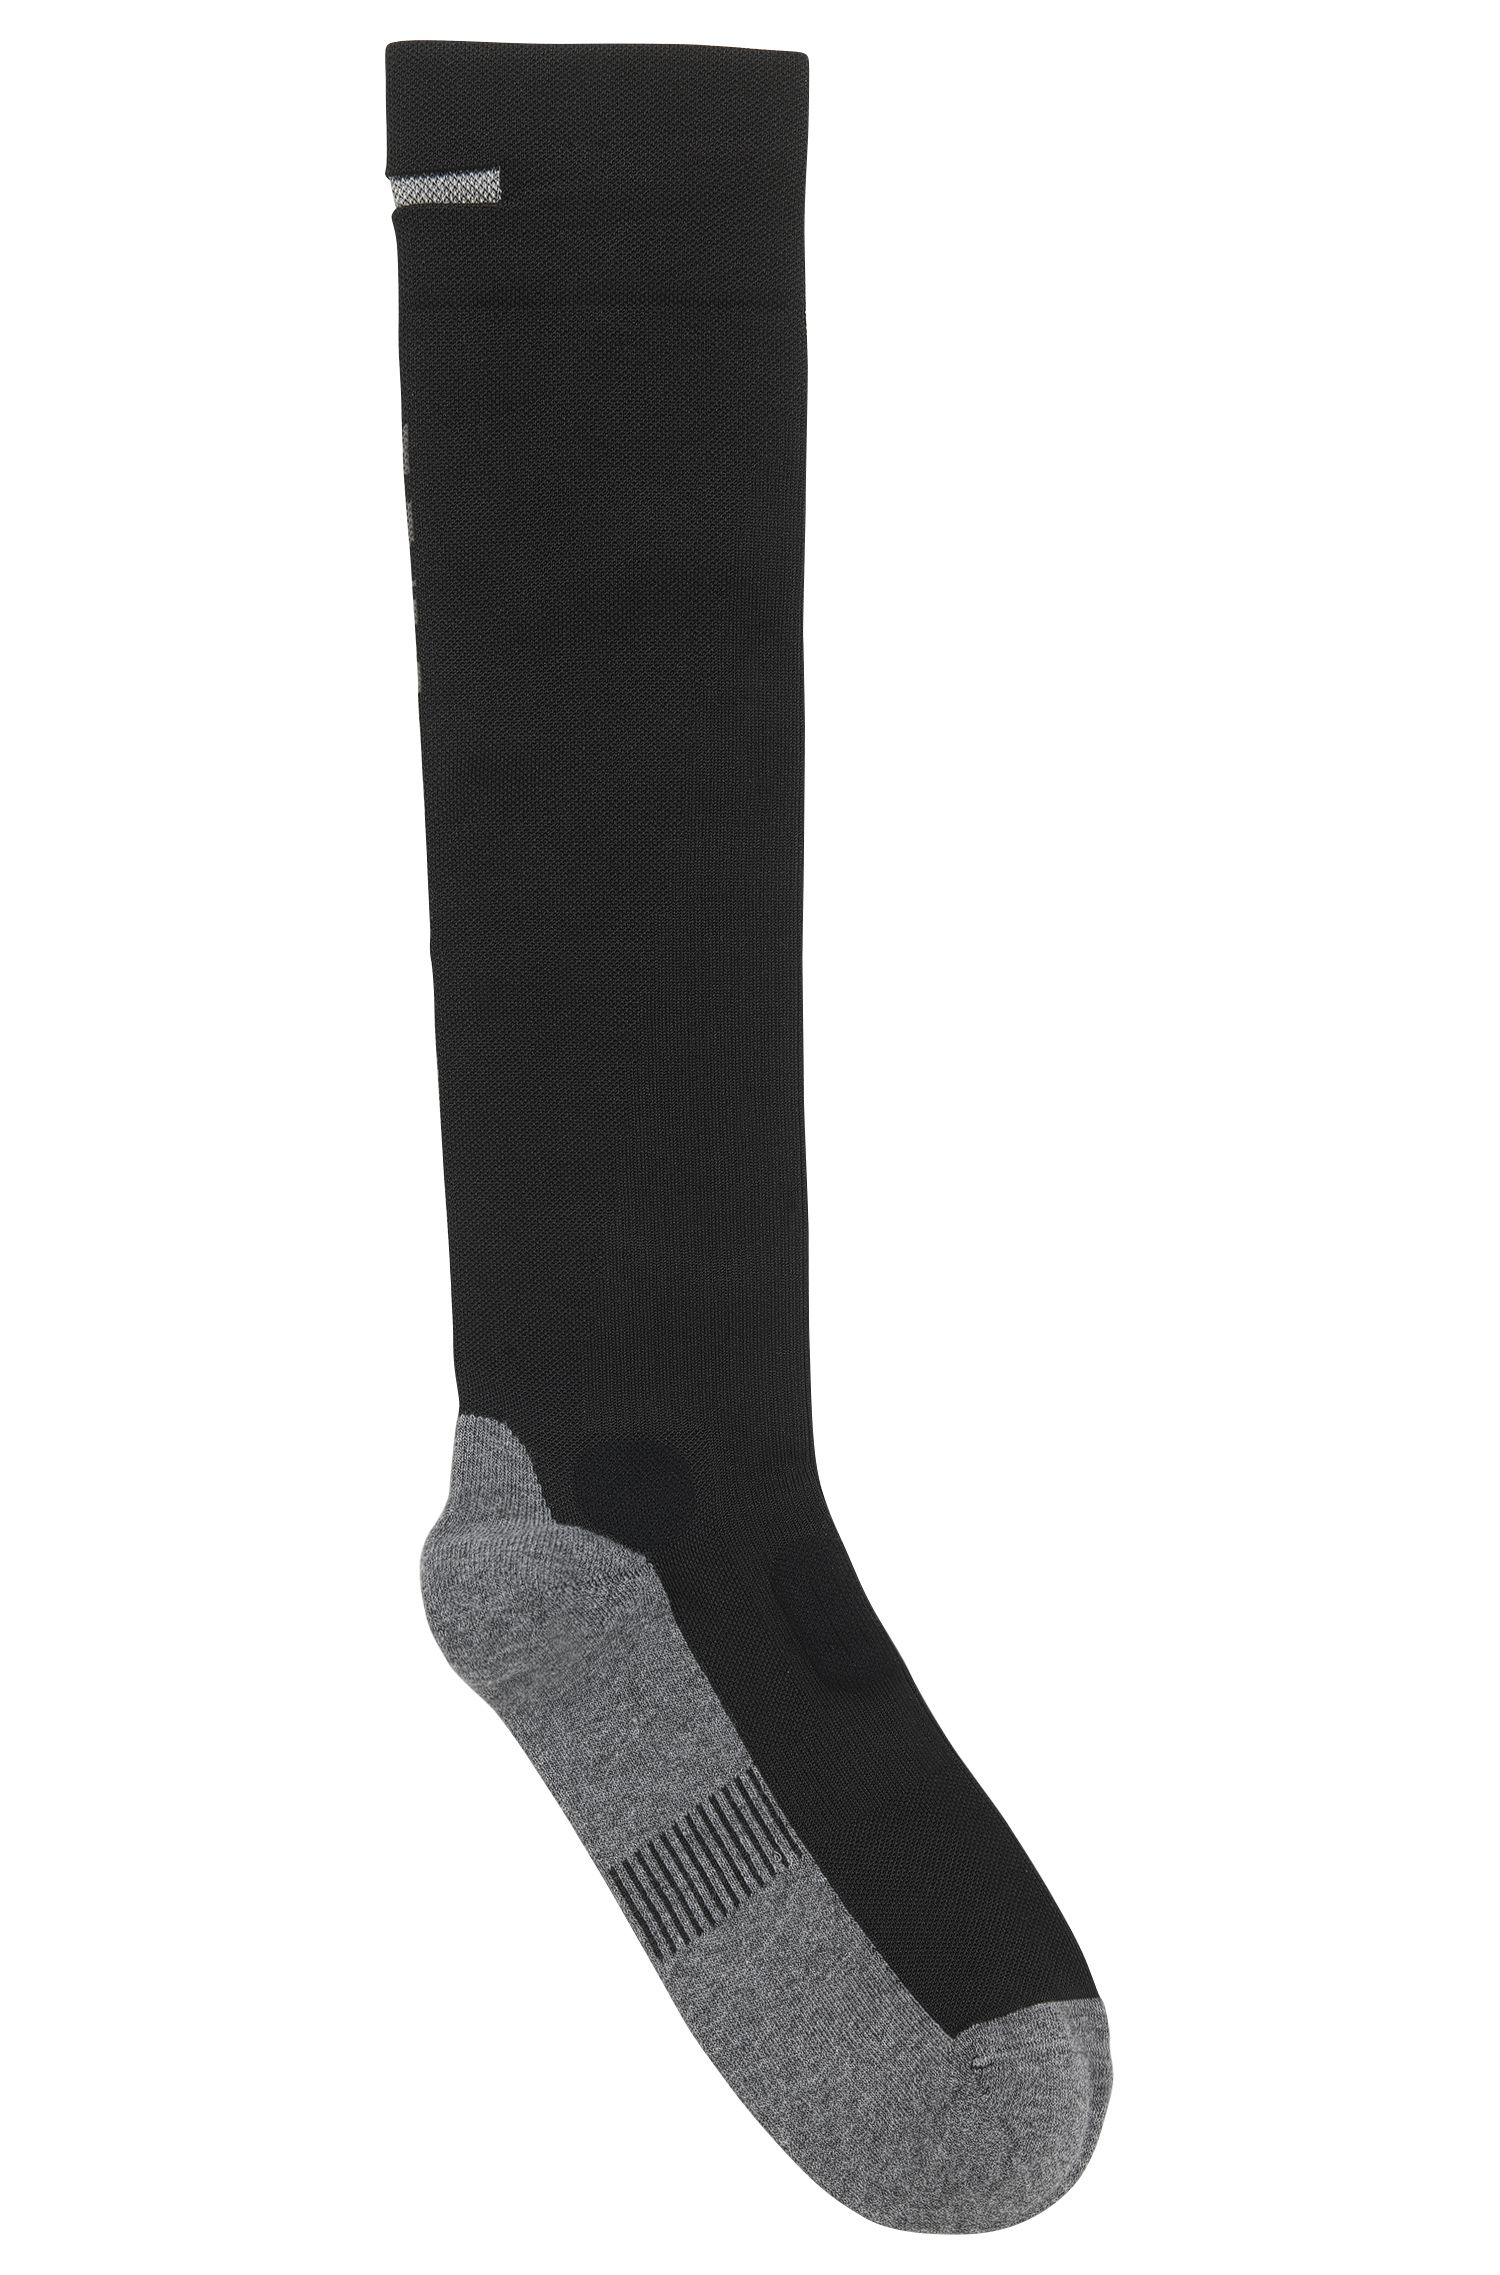 Knee-Length Compression Socks   KH Performance CMax